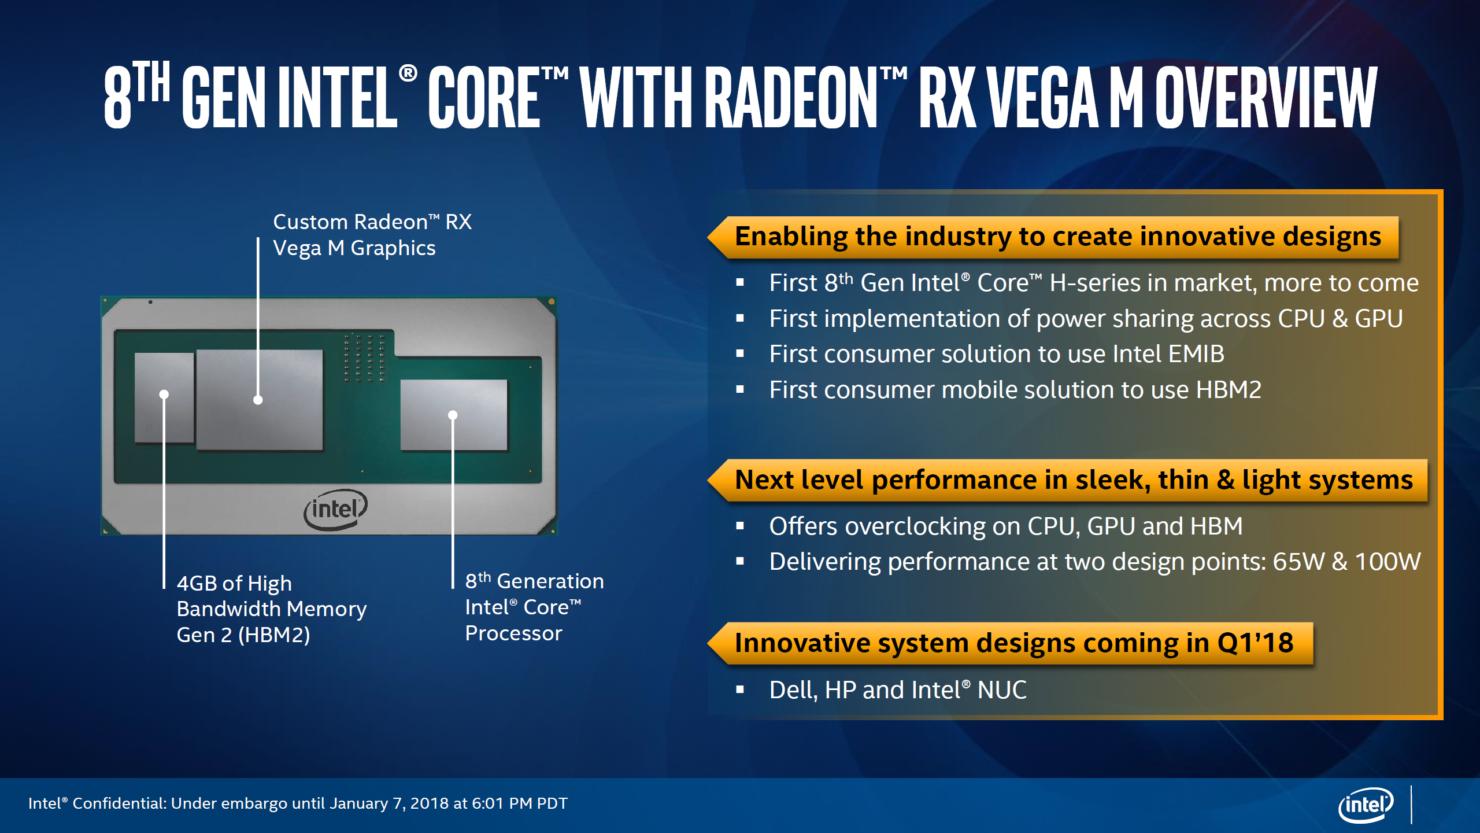 intel-8th-generation-core-processors-with-amd-radeon-rx-vega-m-graphics_5